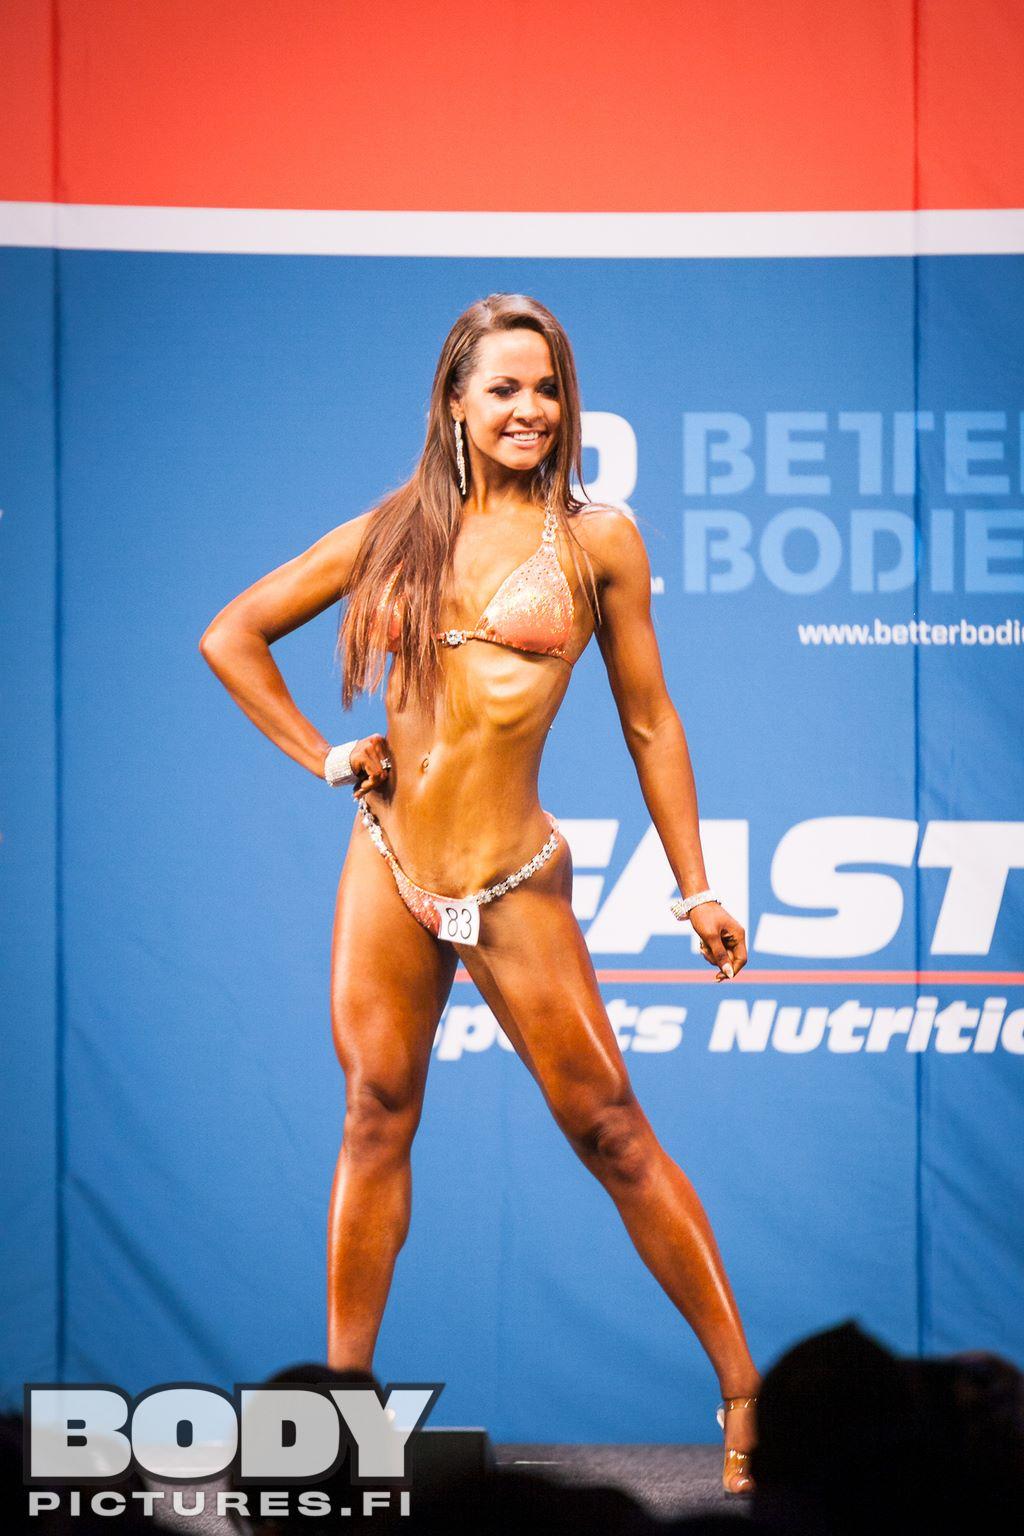 Heidi Edelmann